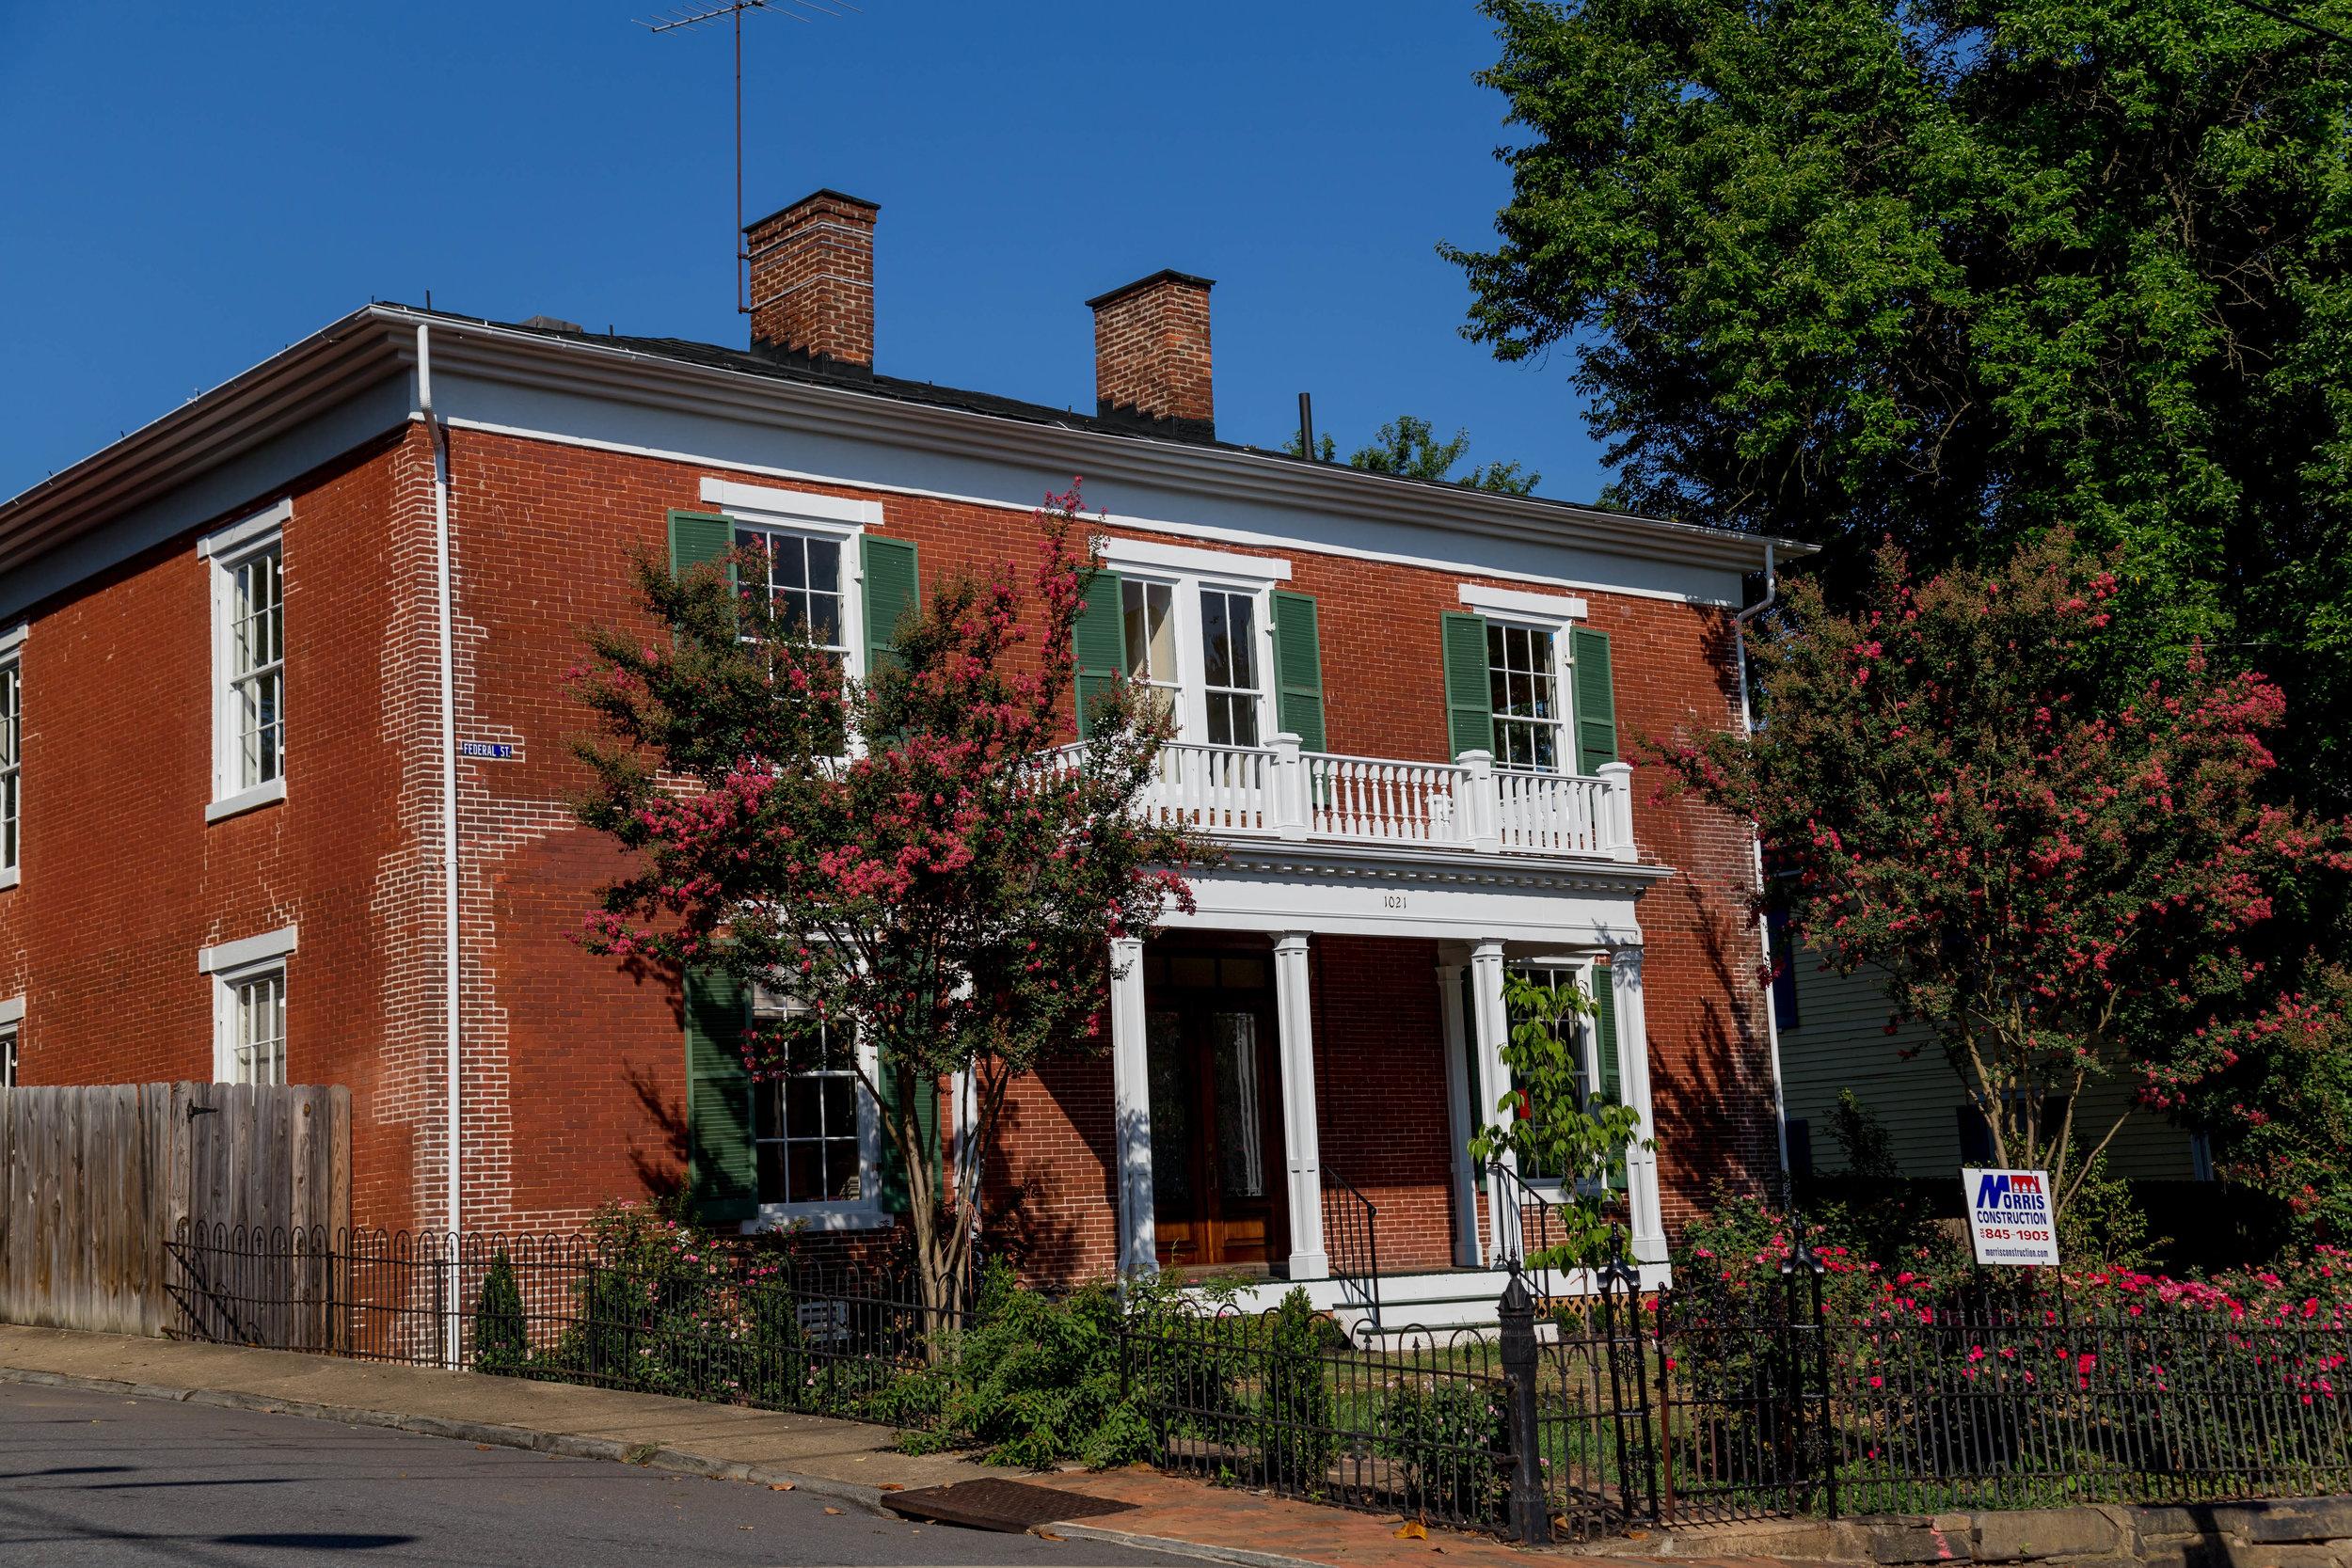 Federal Hill - Est. 1819